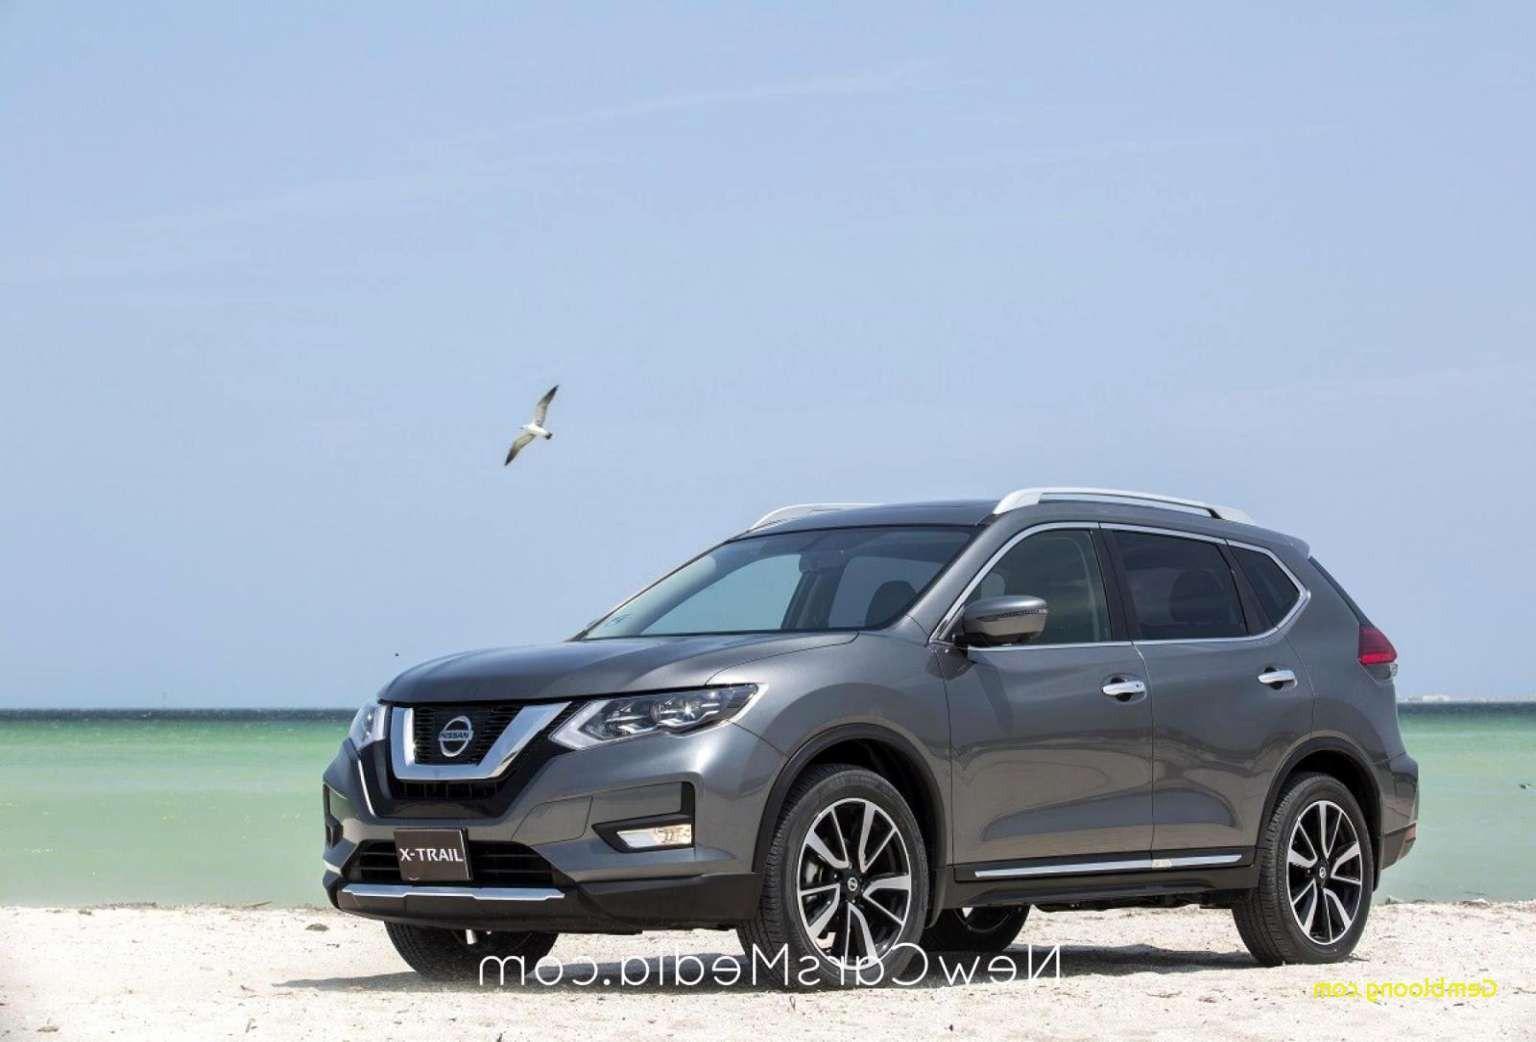 2019 Nissan Rogue Sport Nissan rogue, Nissan, Nissan xtrail